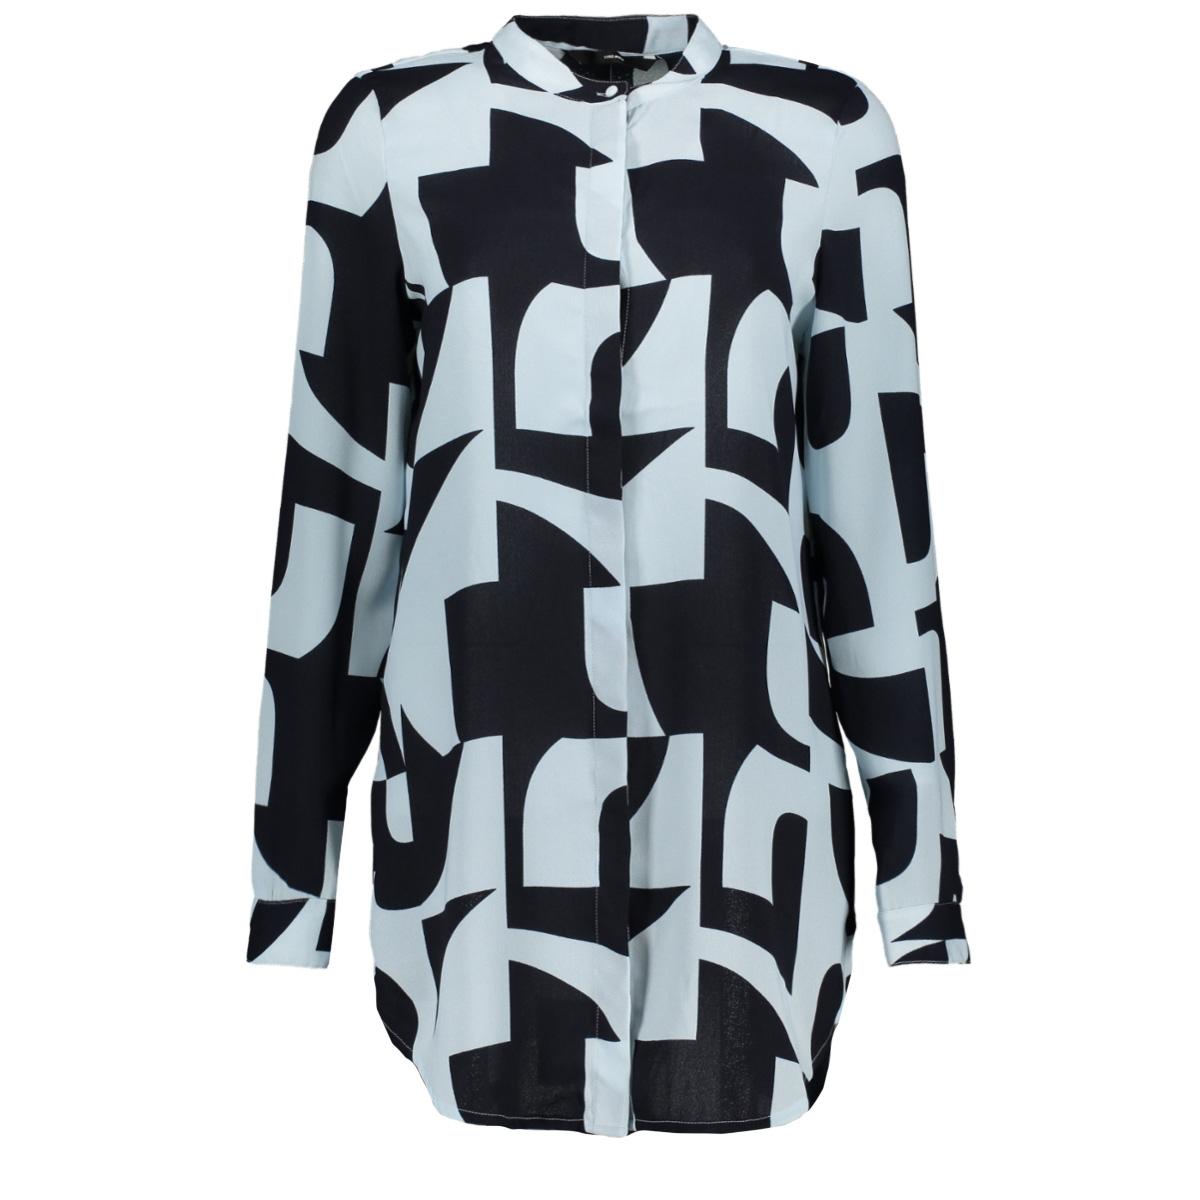 vmboldonia l/s long shirt wvn 10212011 vero moda blouse night sky/boldonia w